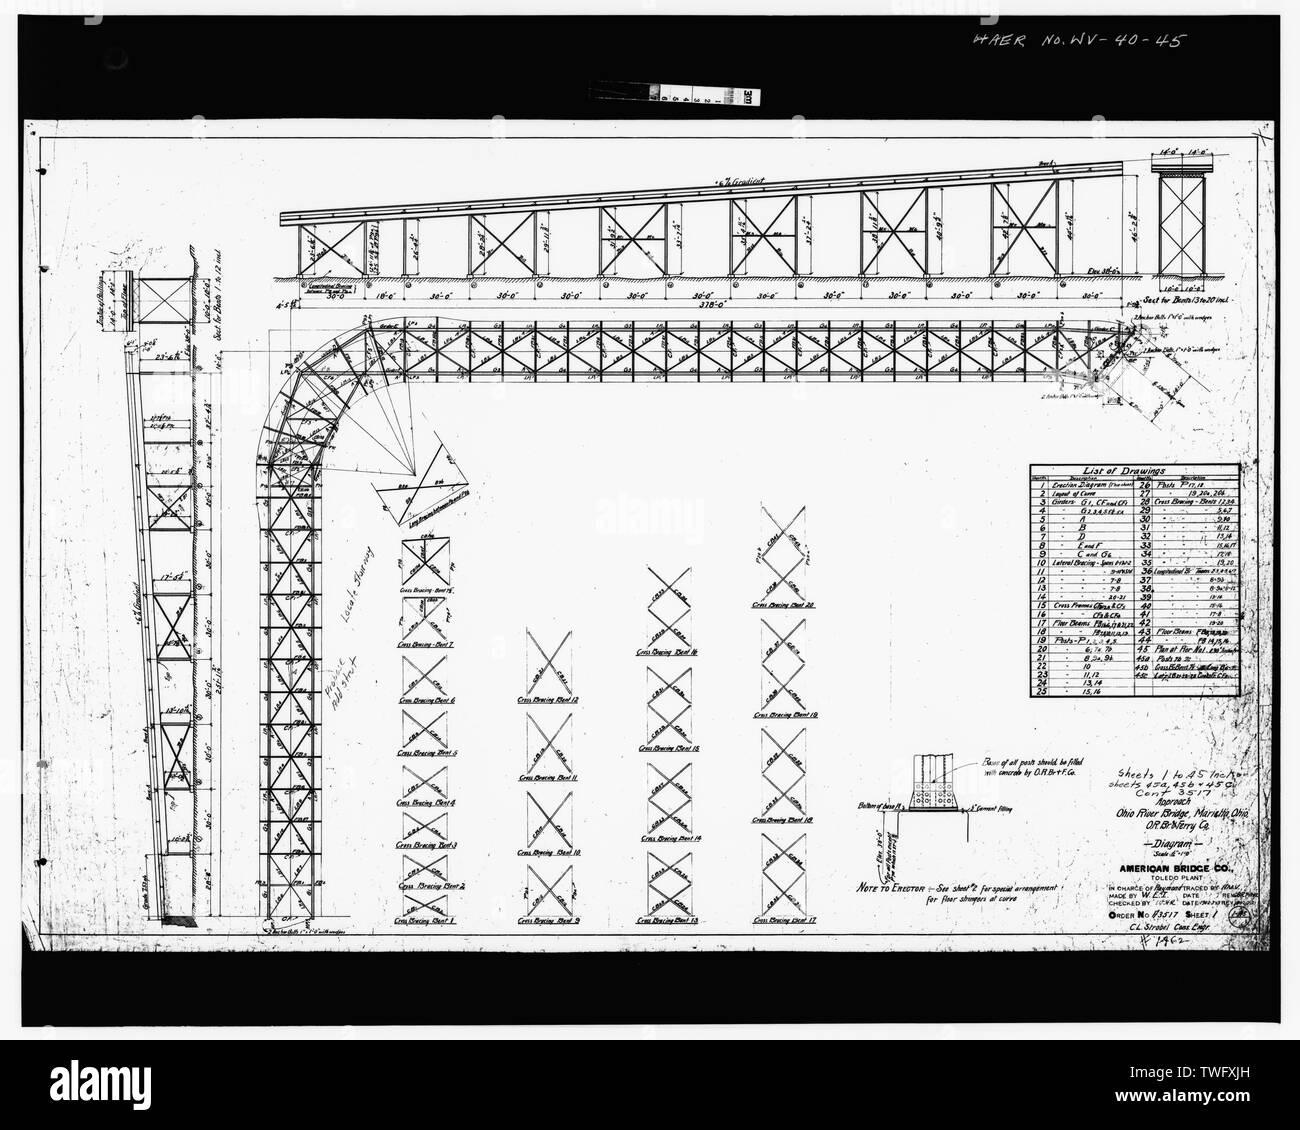 Plan Sheet -1 - Williamstown-Marietta Bridge, Spanning Ohio River between Williamstown and Marietta, Williamstown, Wood County, WV; American Bridge Company; Strobel, Charles L; Ripley, T M - Stock Image